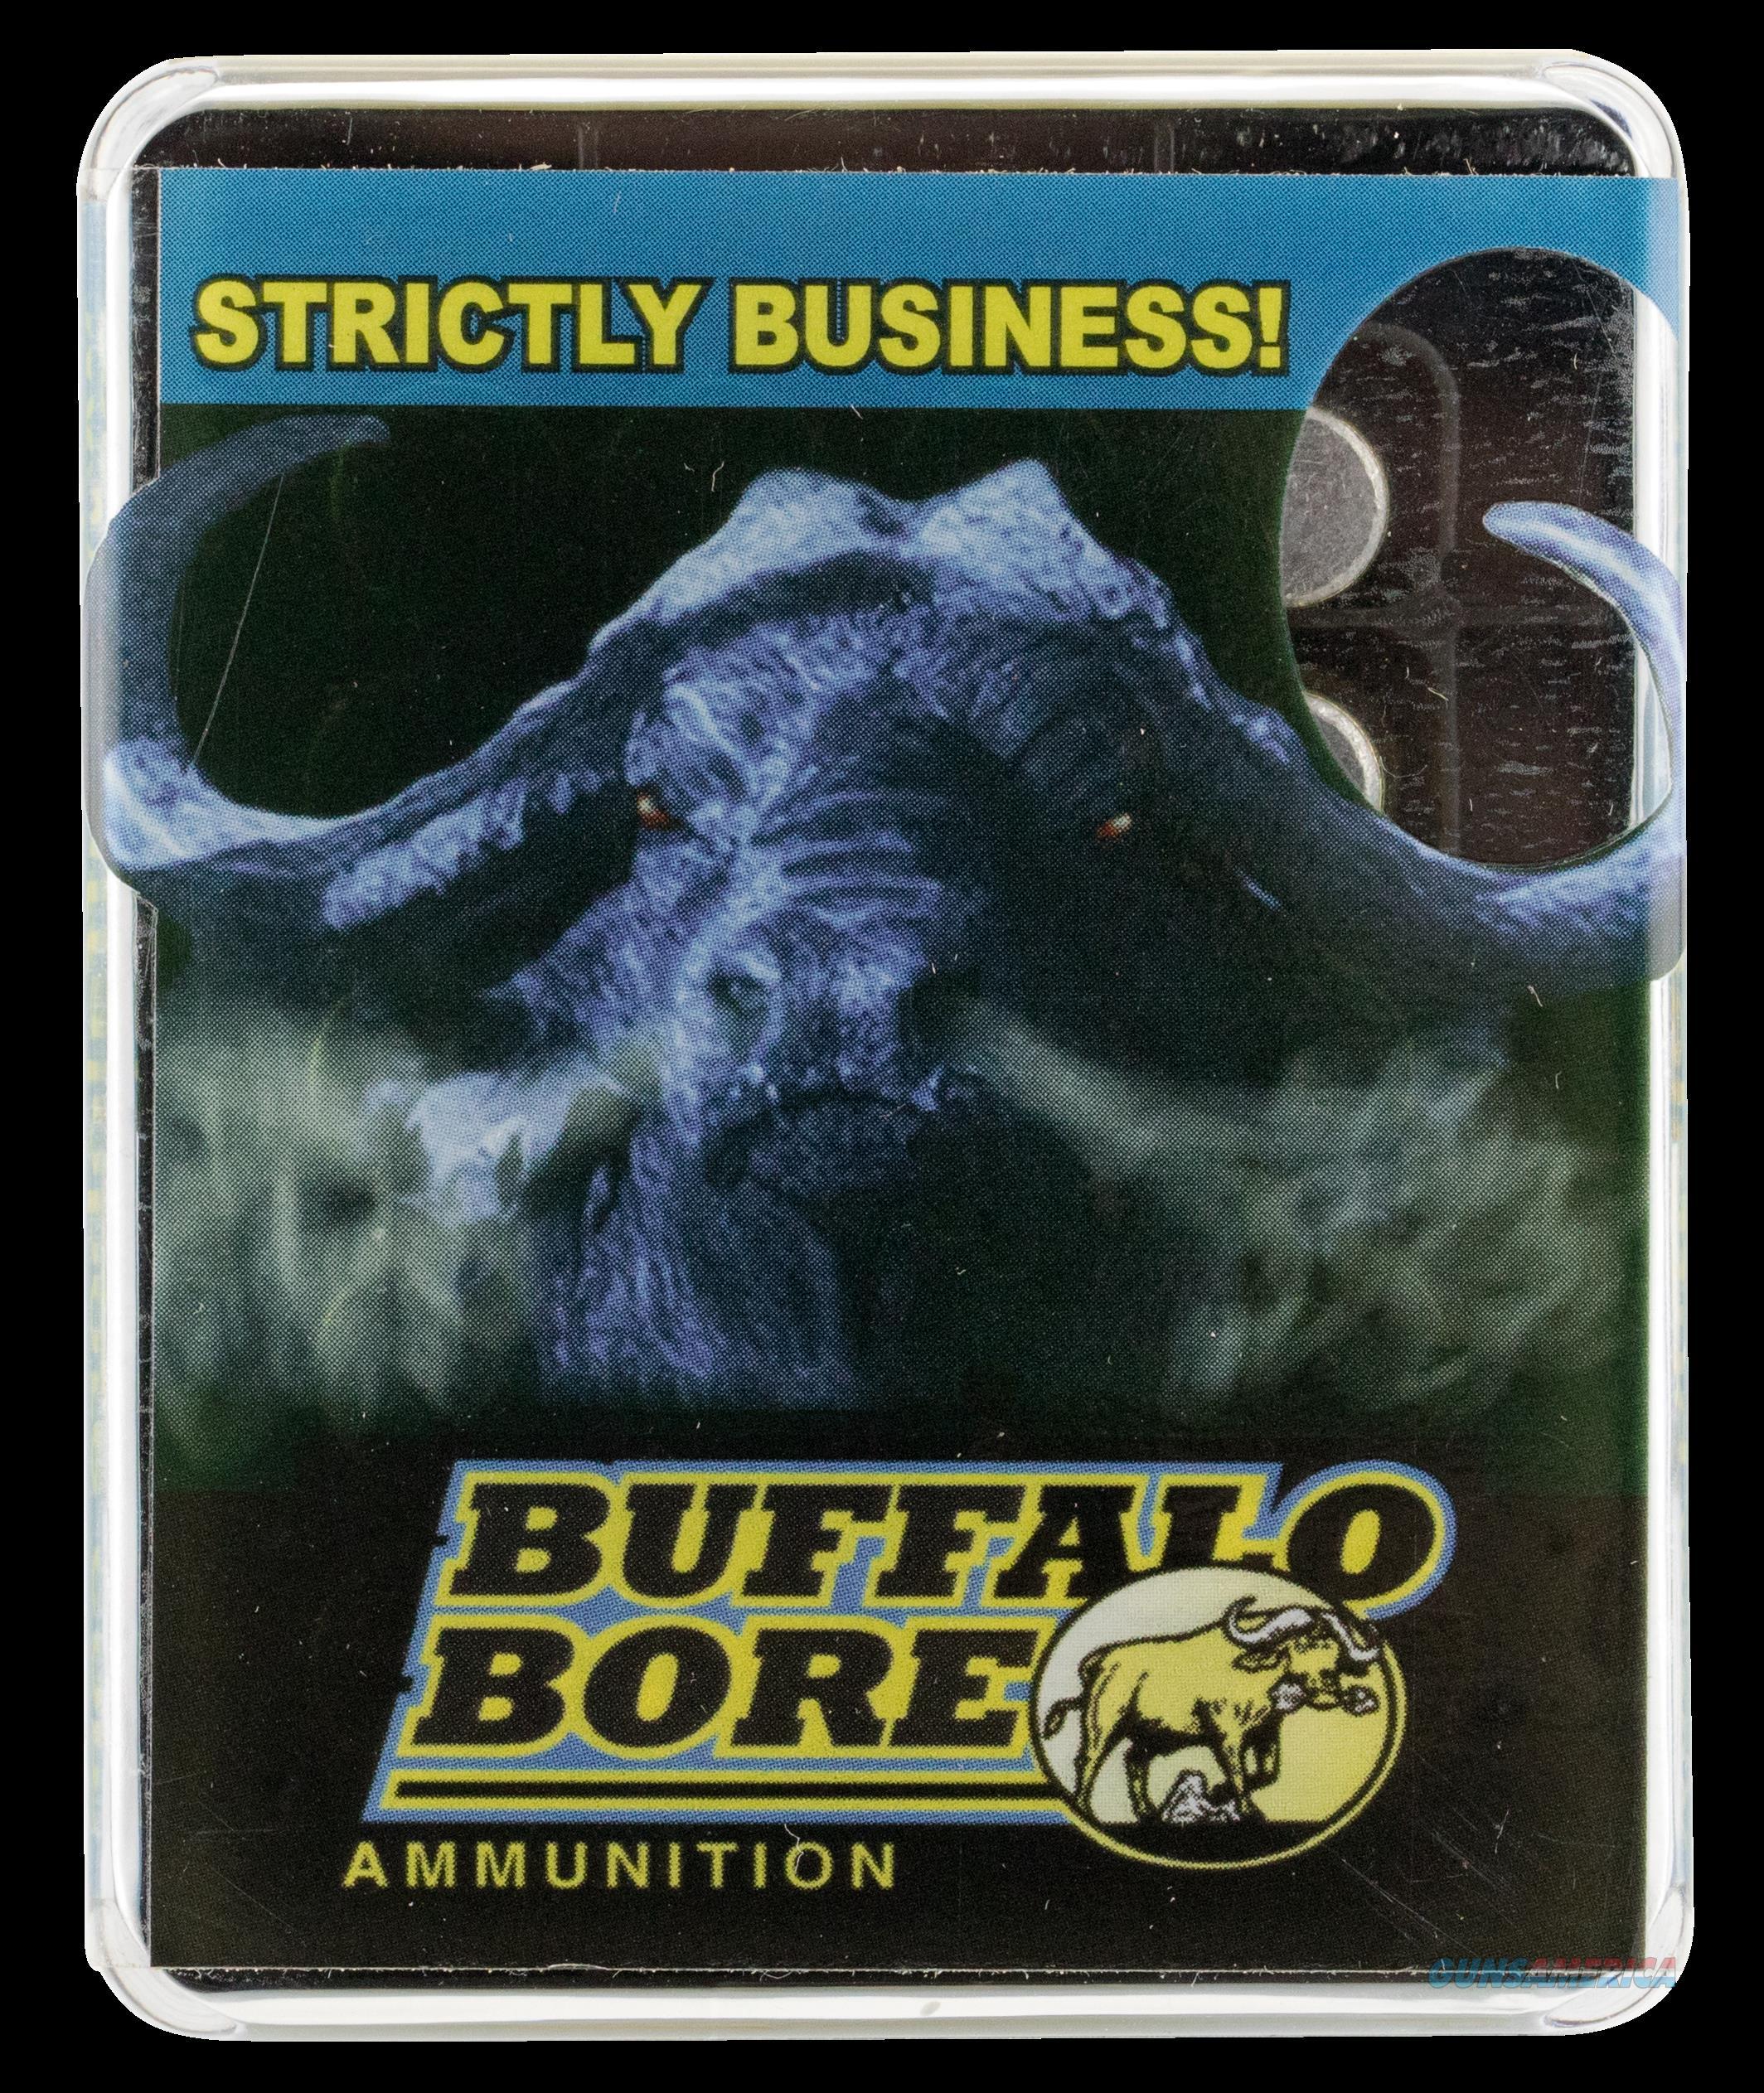 Buffalo Bore Ammunition Heavy, Bba 4a-20 44rm  305gr Lbt Cast   20-12  Guns > Pistols > 1911 Pistol Copies (non-Colt)